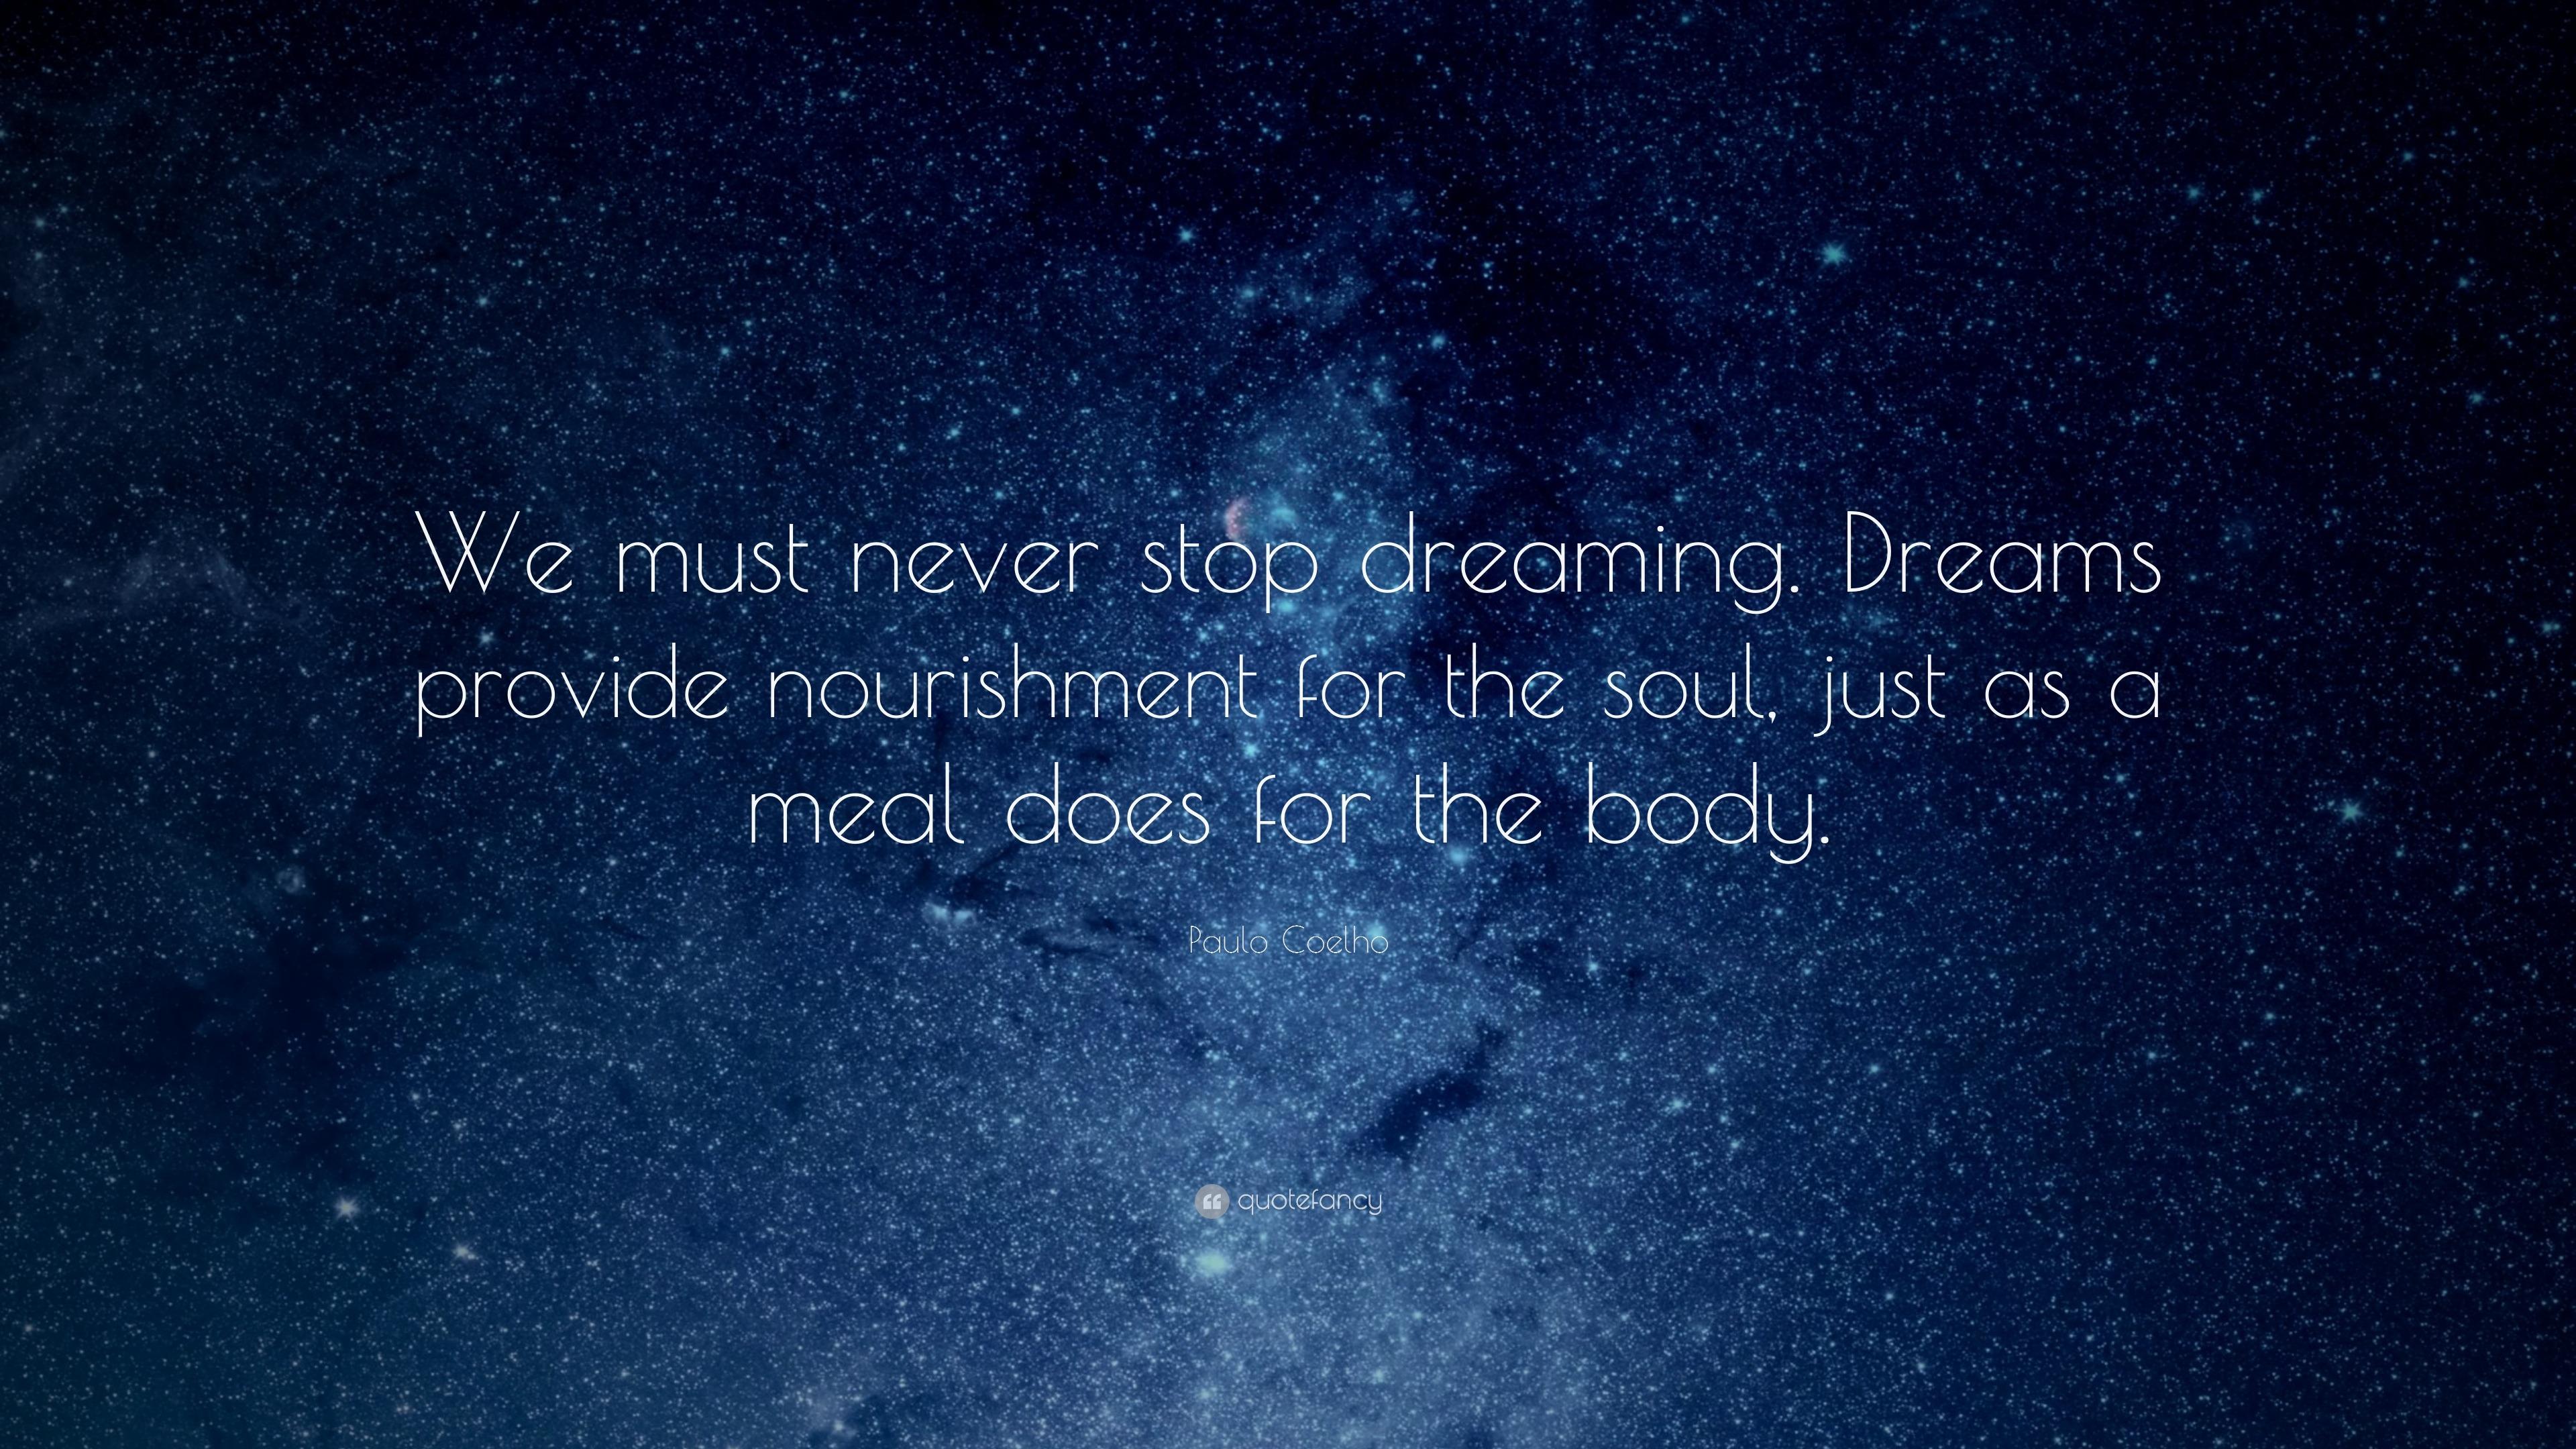 Paulo Coelho Quote We Must Never Stop Dreaming Dreams